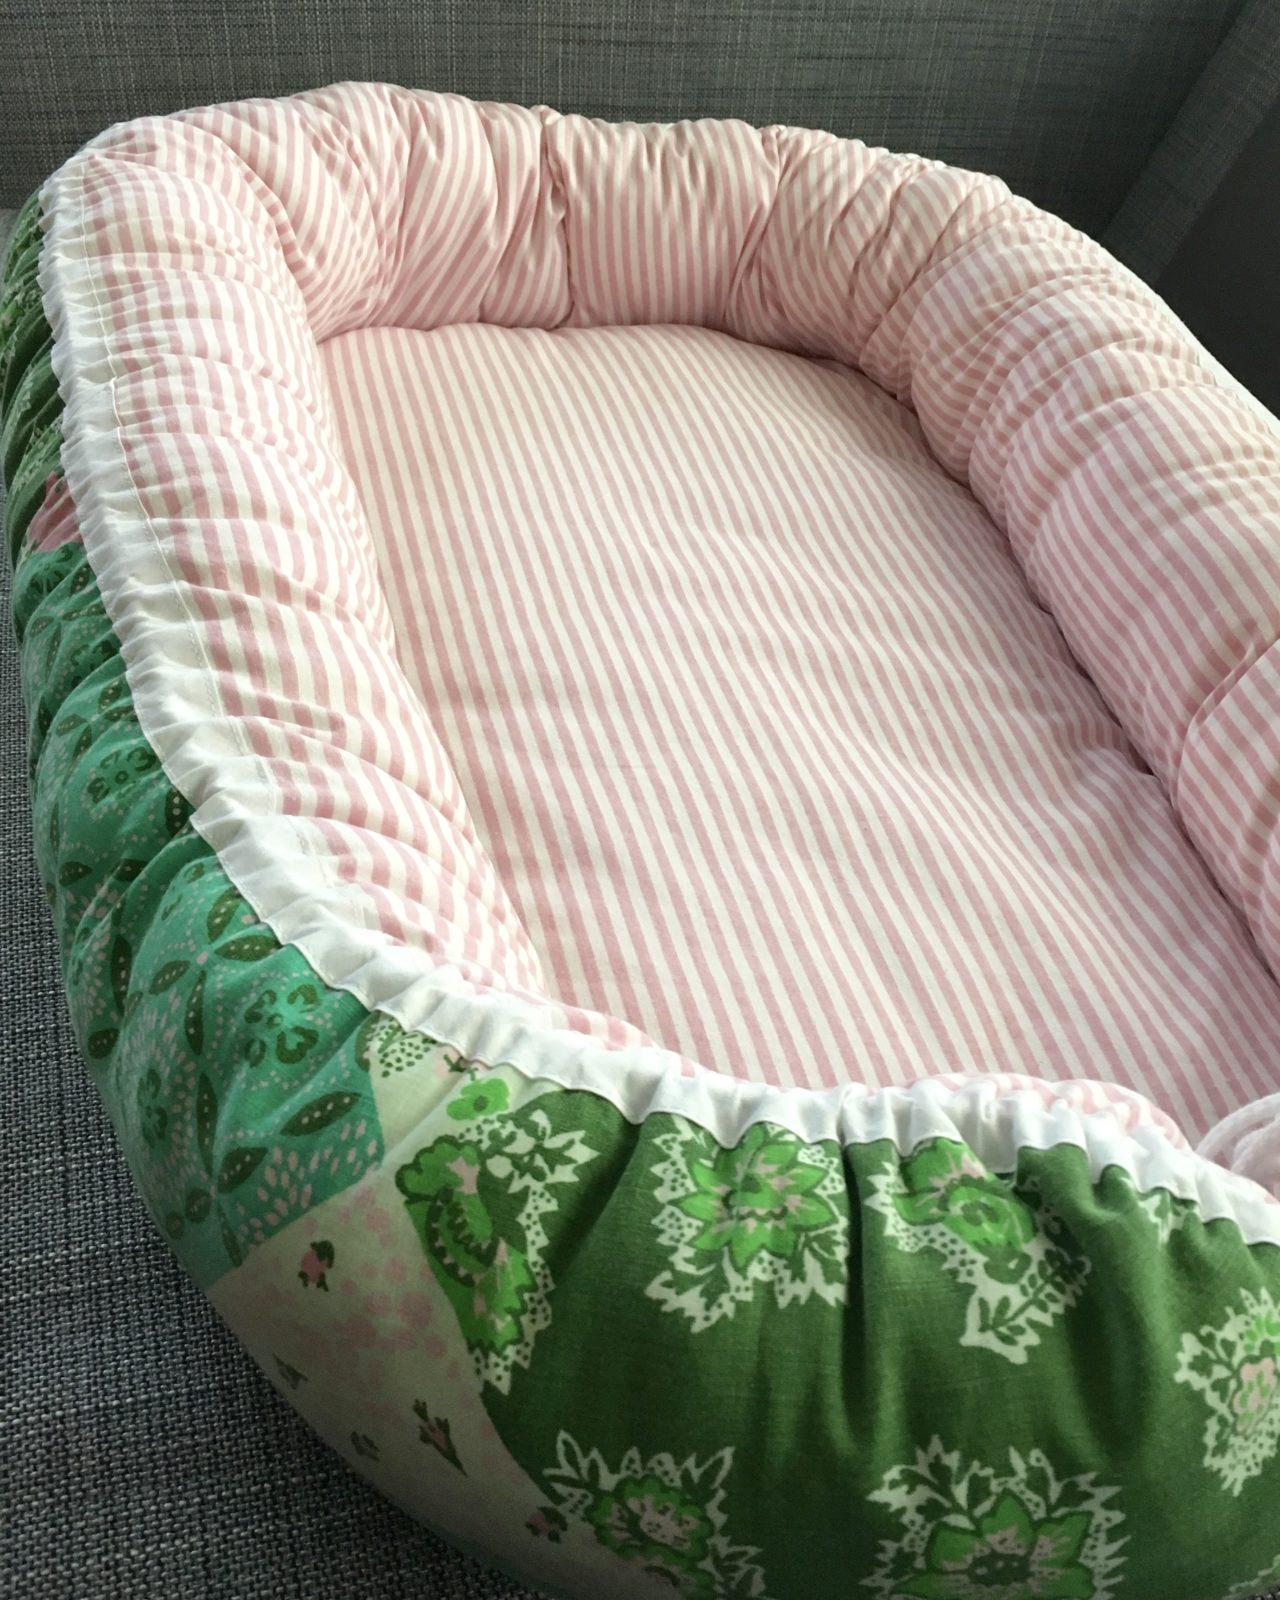 Babynest Retro retrotyg Vintage Vintagetyg Återbruk Eko Miljövänligt Barnbädd